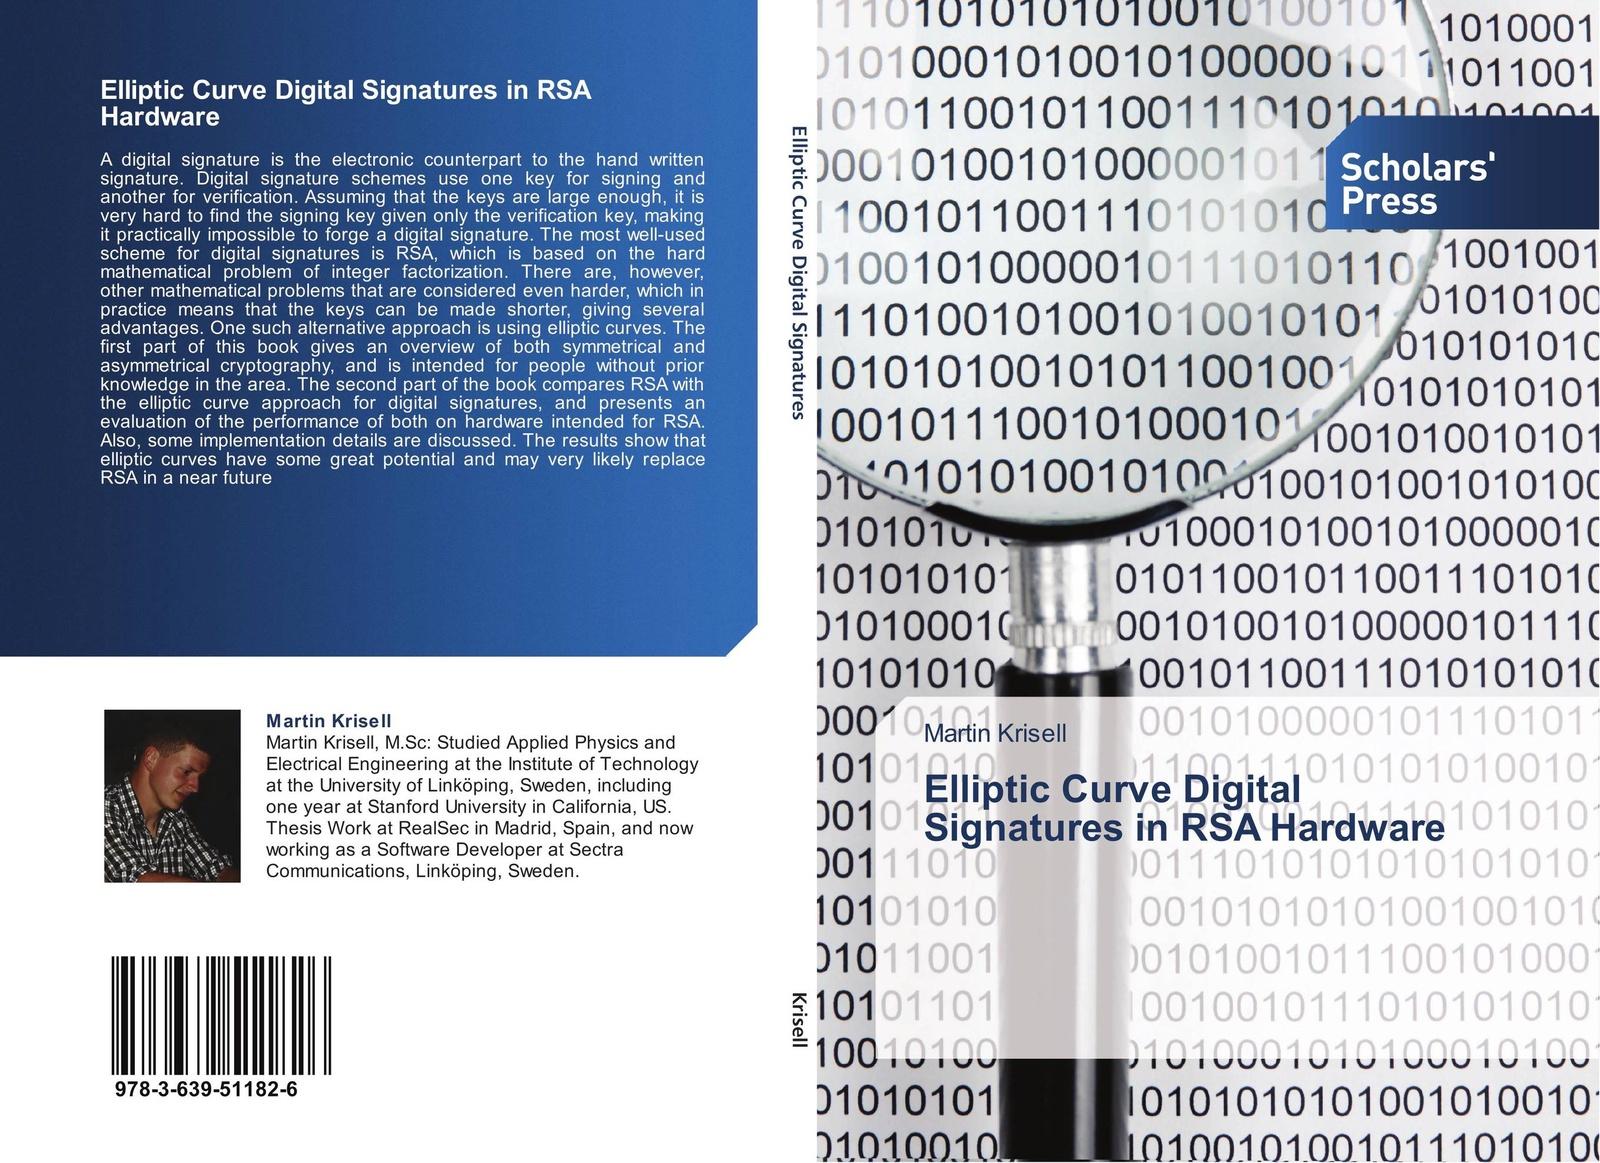 Martin Krisell Elliptic Curve Digital Signatures in RSA Hardware digital signature schemes based on multiple hard problems